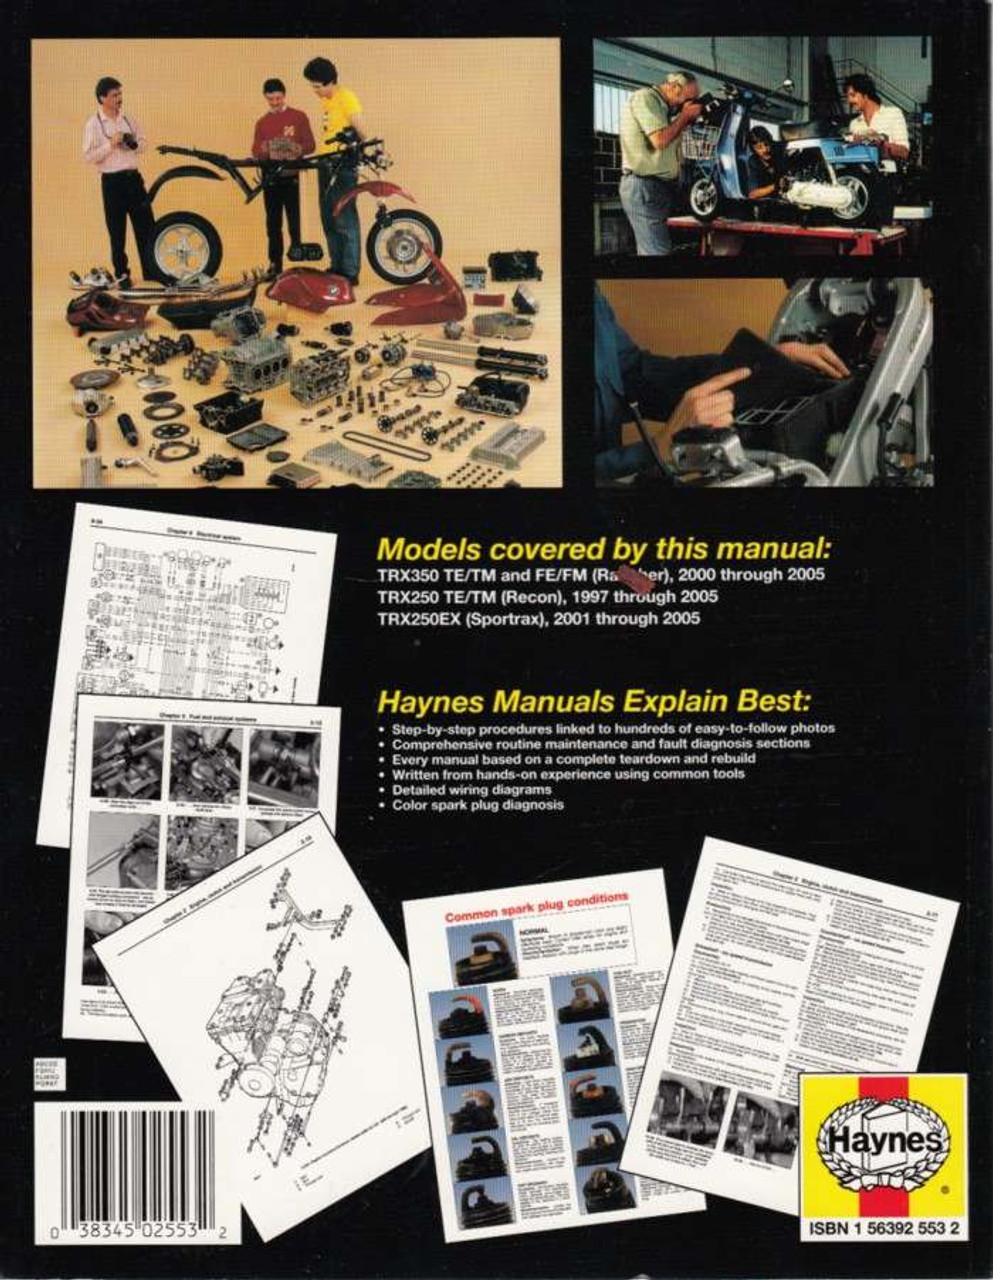 medium resolution of  honda trx350 rancher trx250 recon trx250ex sportrax atvs 1997 2005 workshop manual back